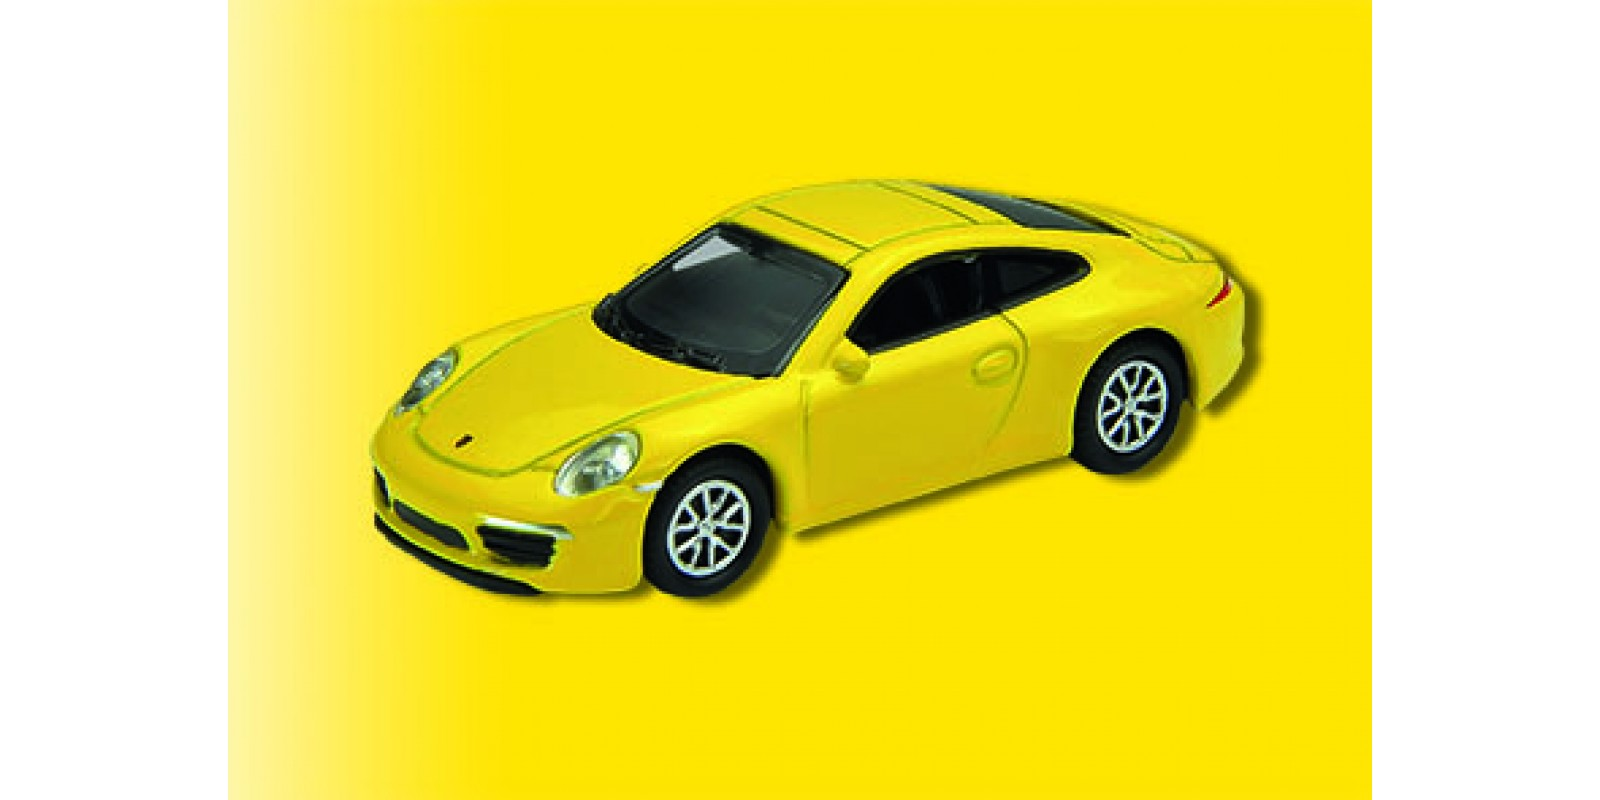 Vo41612 H0 Porsche 911 Carrera S, yellow, finished model